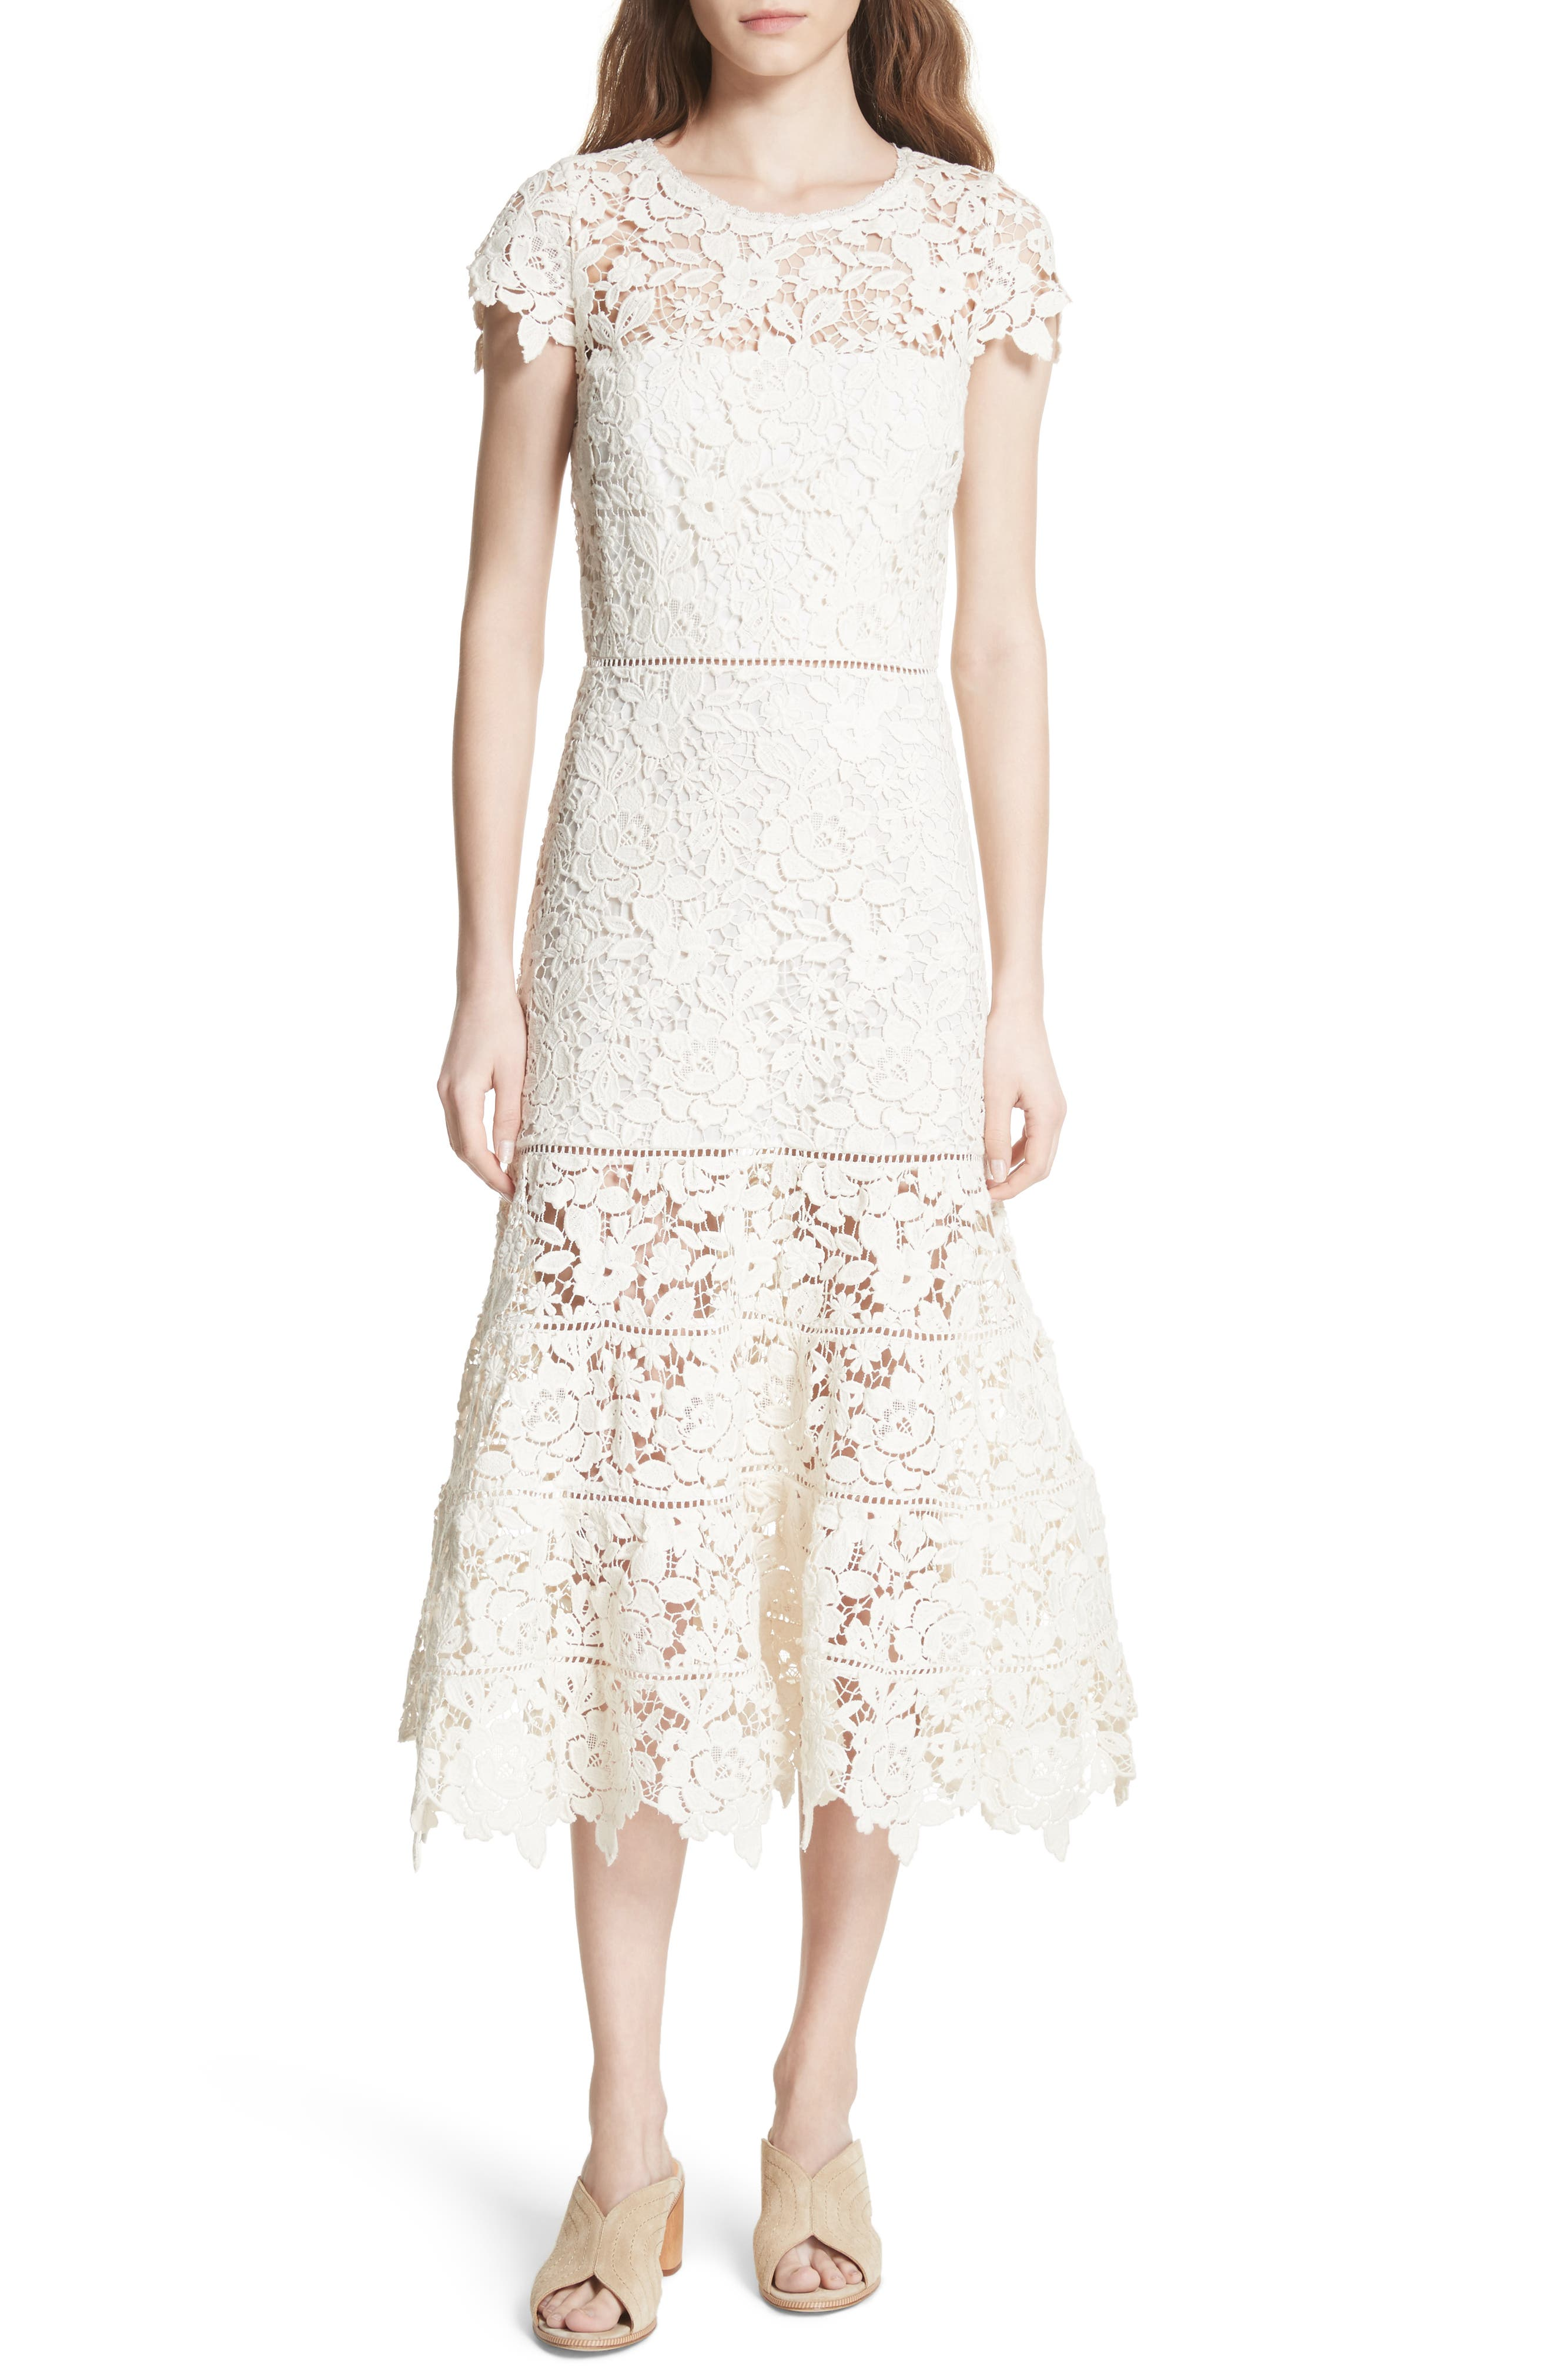 Celedonia Scallop Lace Dress,                         Main,                         color, 120